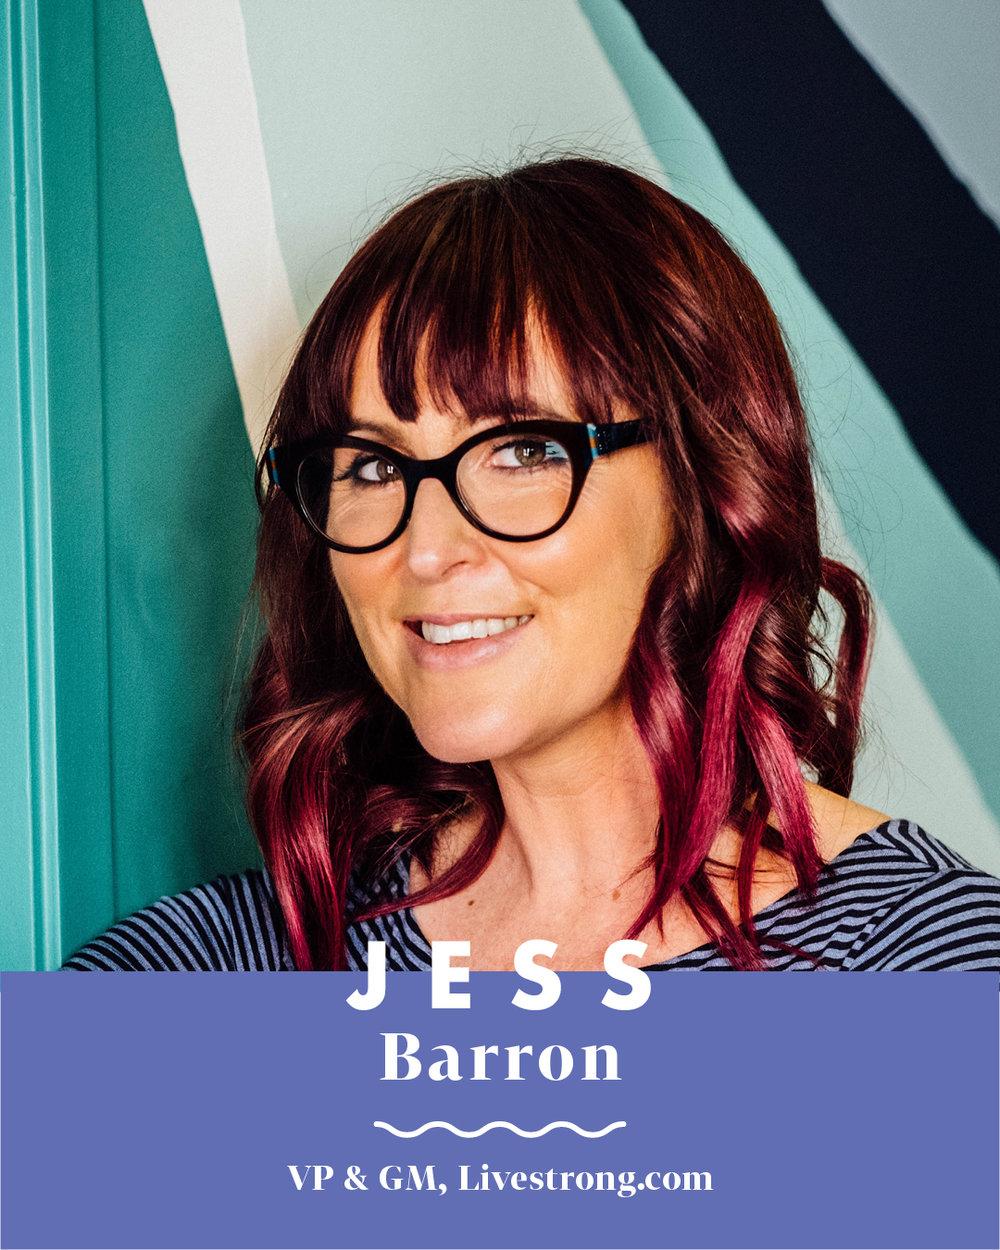 jess-barron.jpg